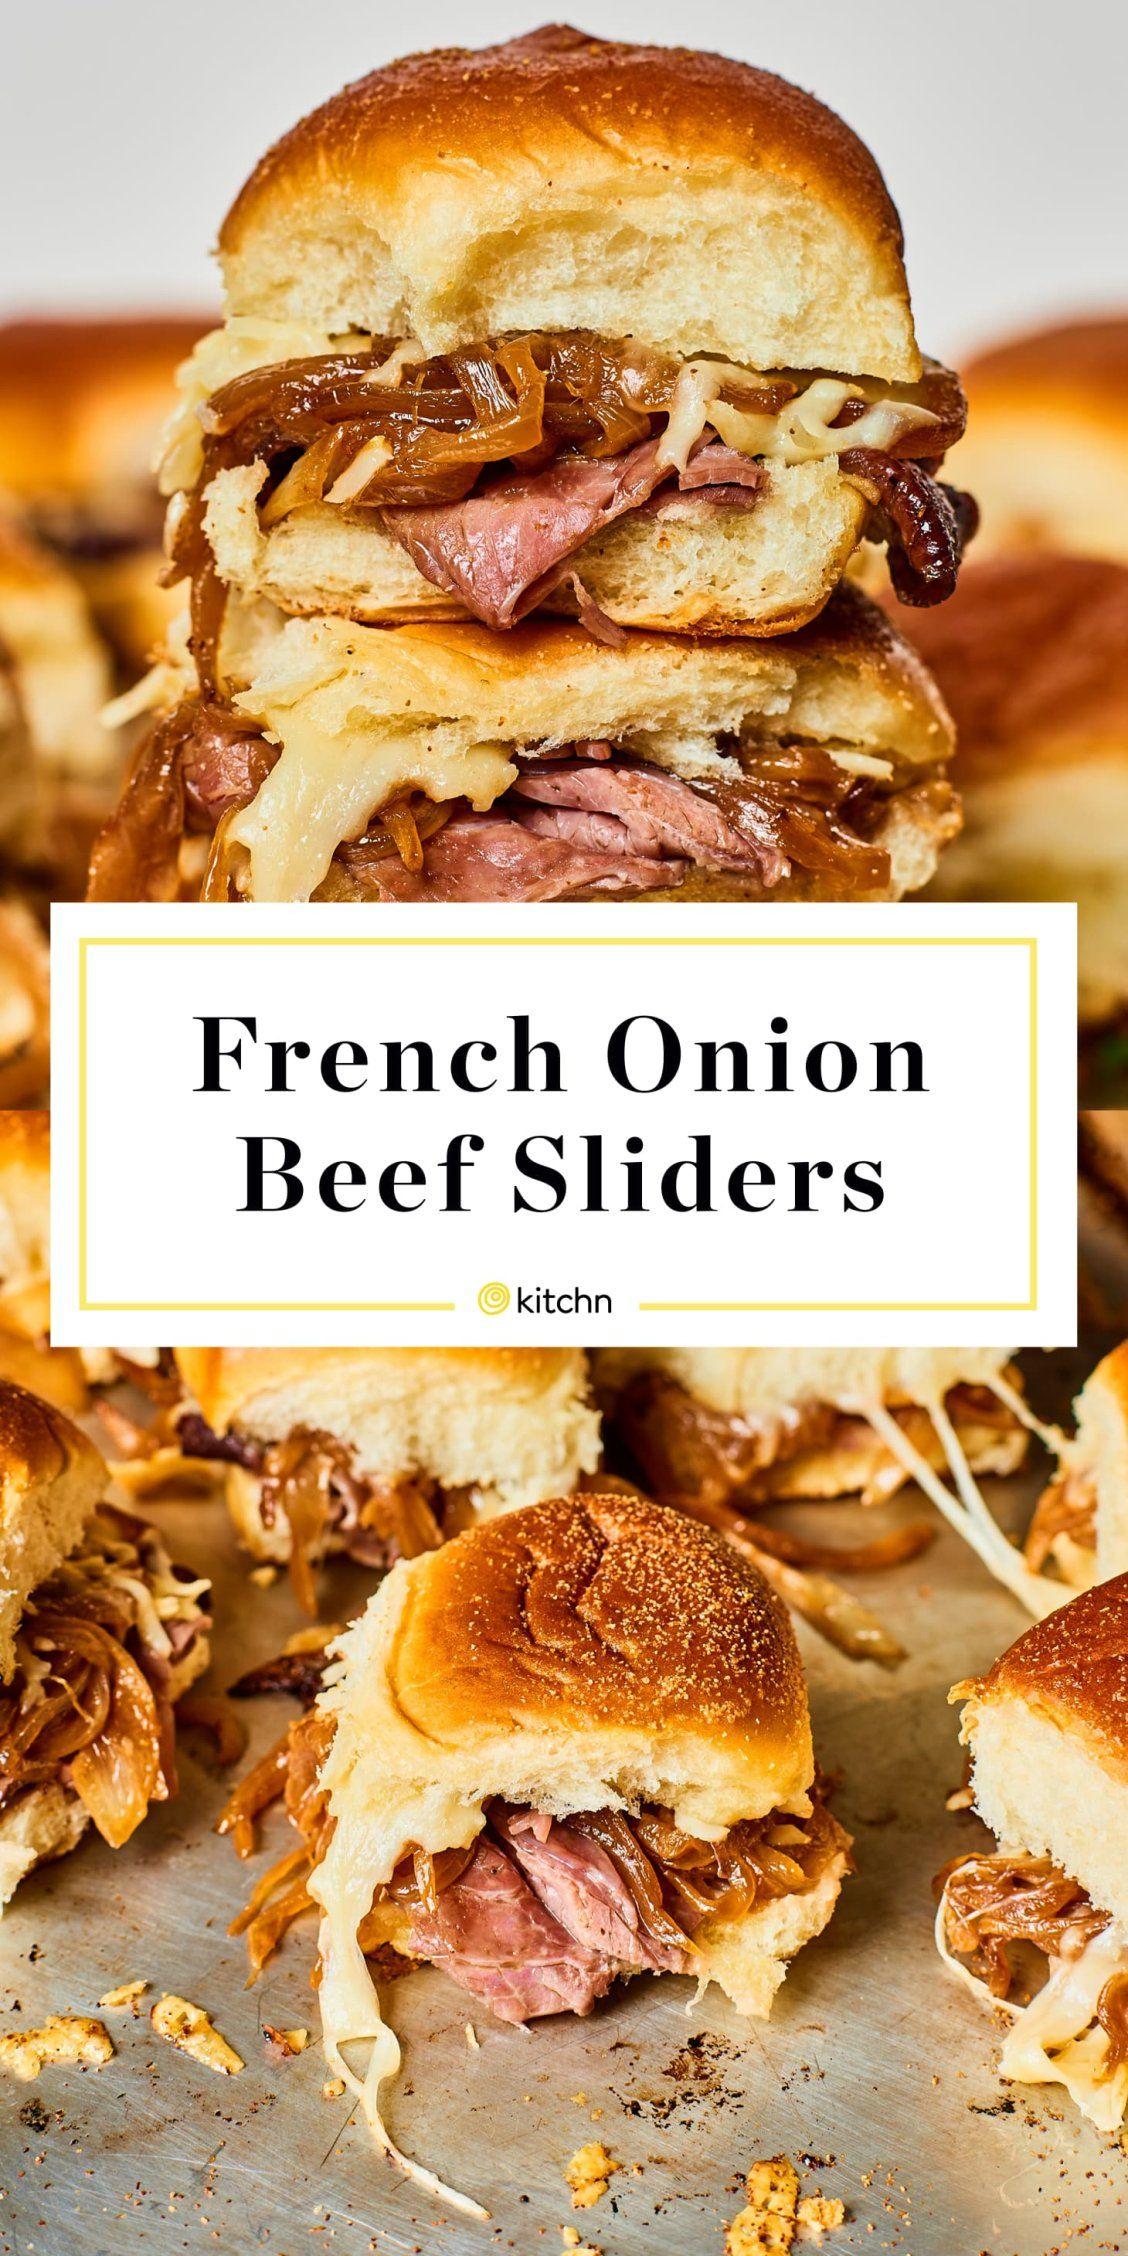 Recipe Hawaiian Roll Party Sliders Recipe In 2021 Beef Recipes Slider Recipes Recipes